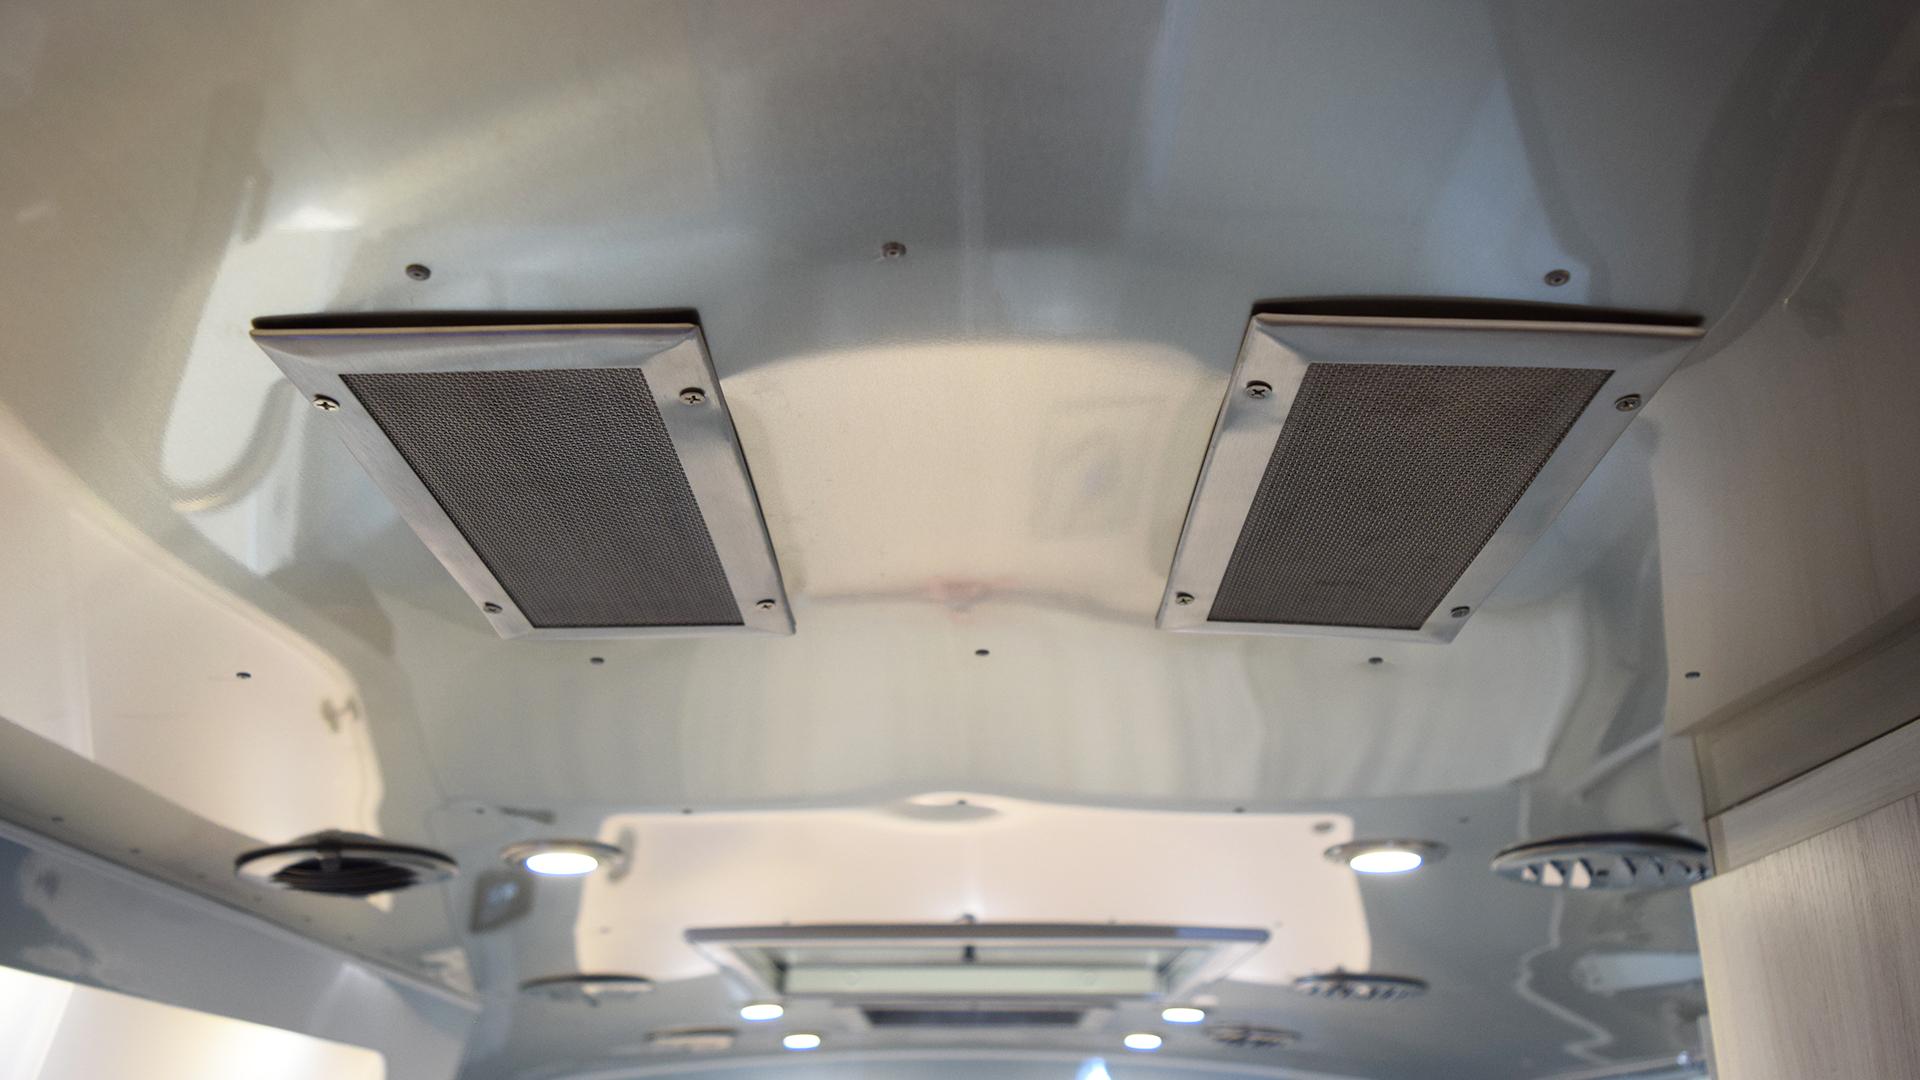 Airstream-Quietstream-Intake-Vents-on-Ceiling